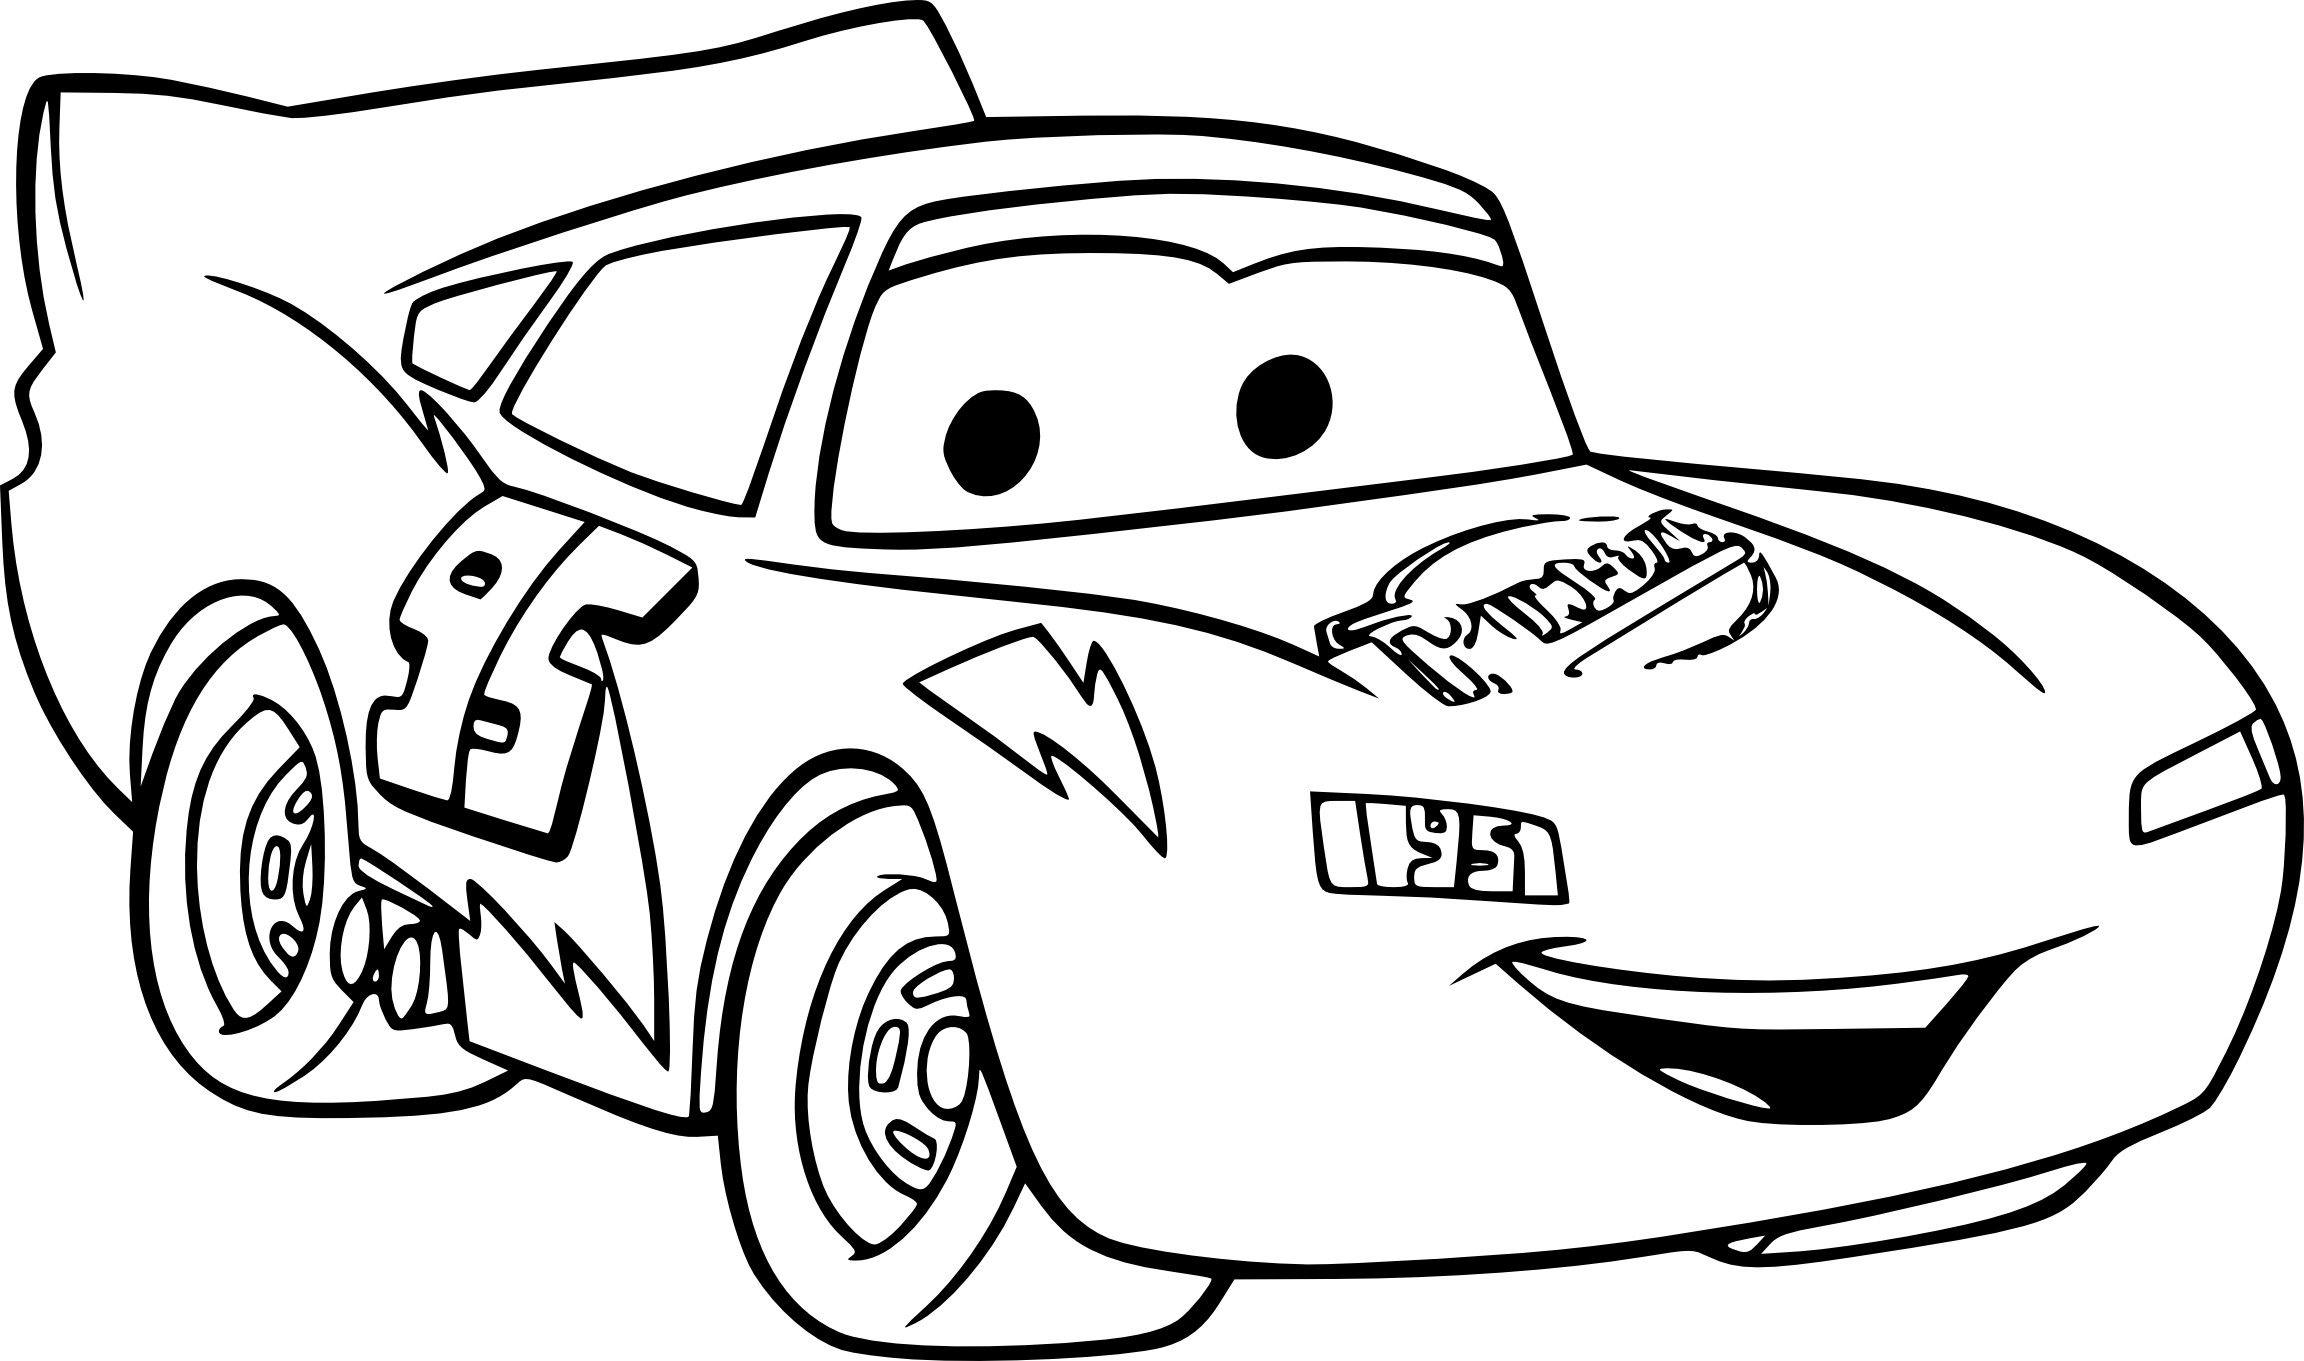 Dessin A Colorier Cars Cars Coloring Pages Disney